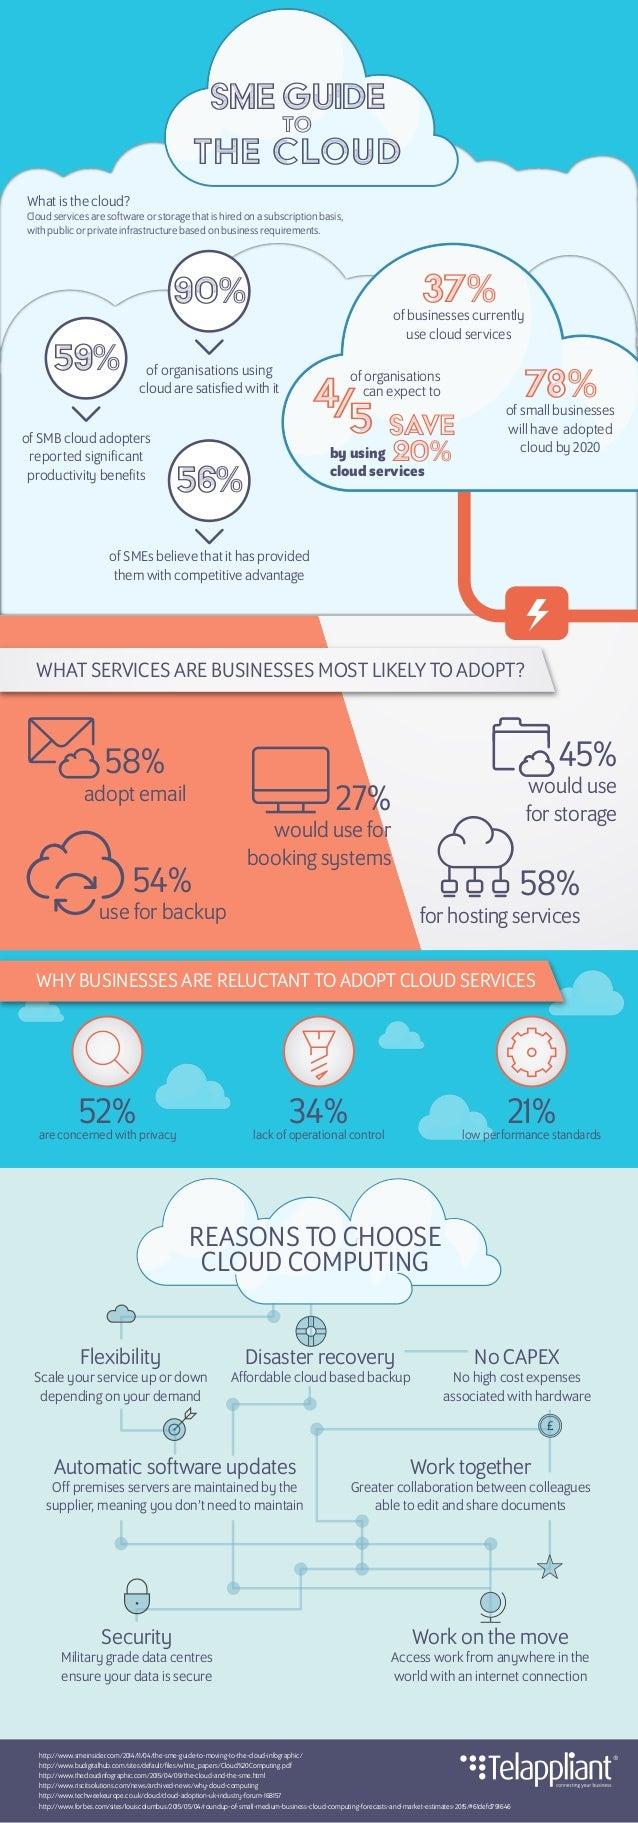 http://www.smeinsider.com/2014/11/04/the-sme-guide-to-moving-to-the-cloud-infographic/ http://www.budigitalhub.com/sites/d...